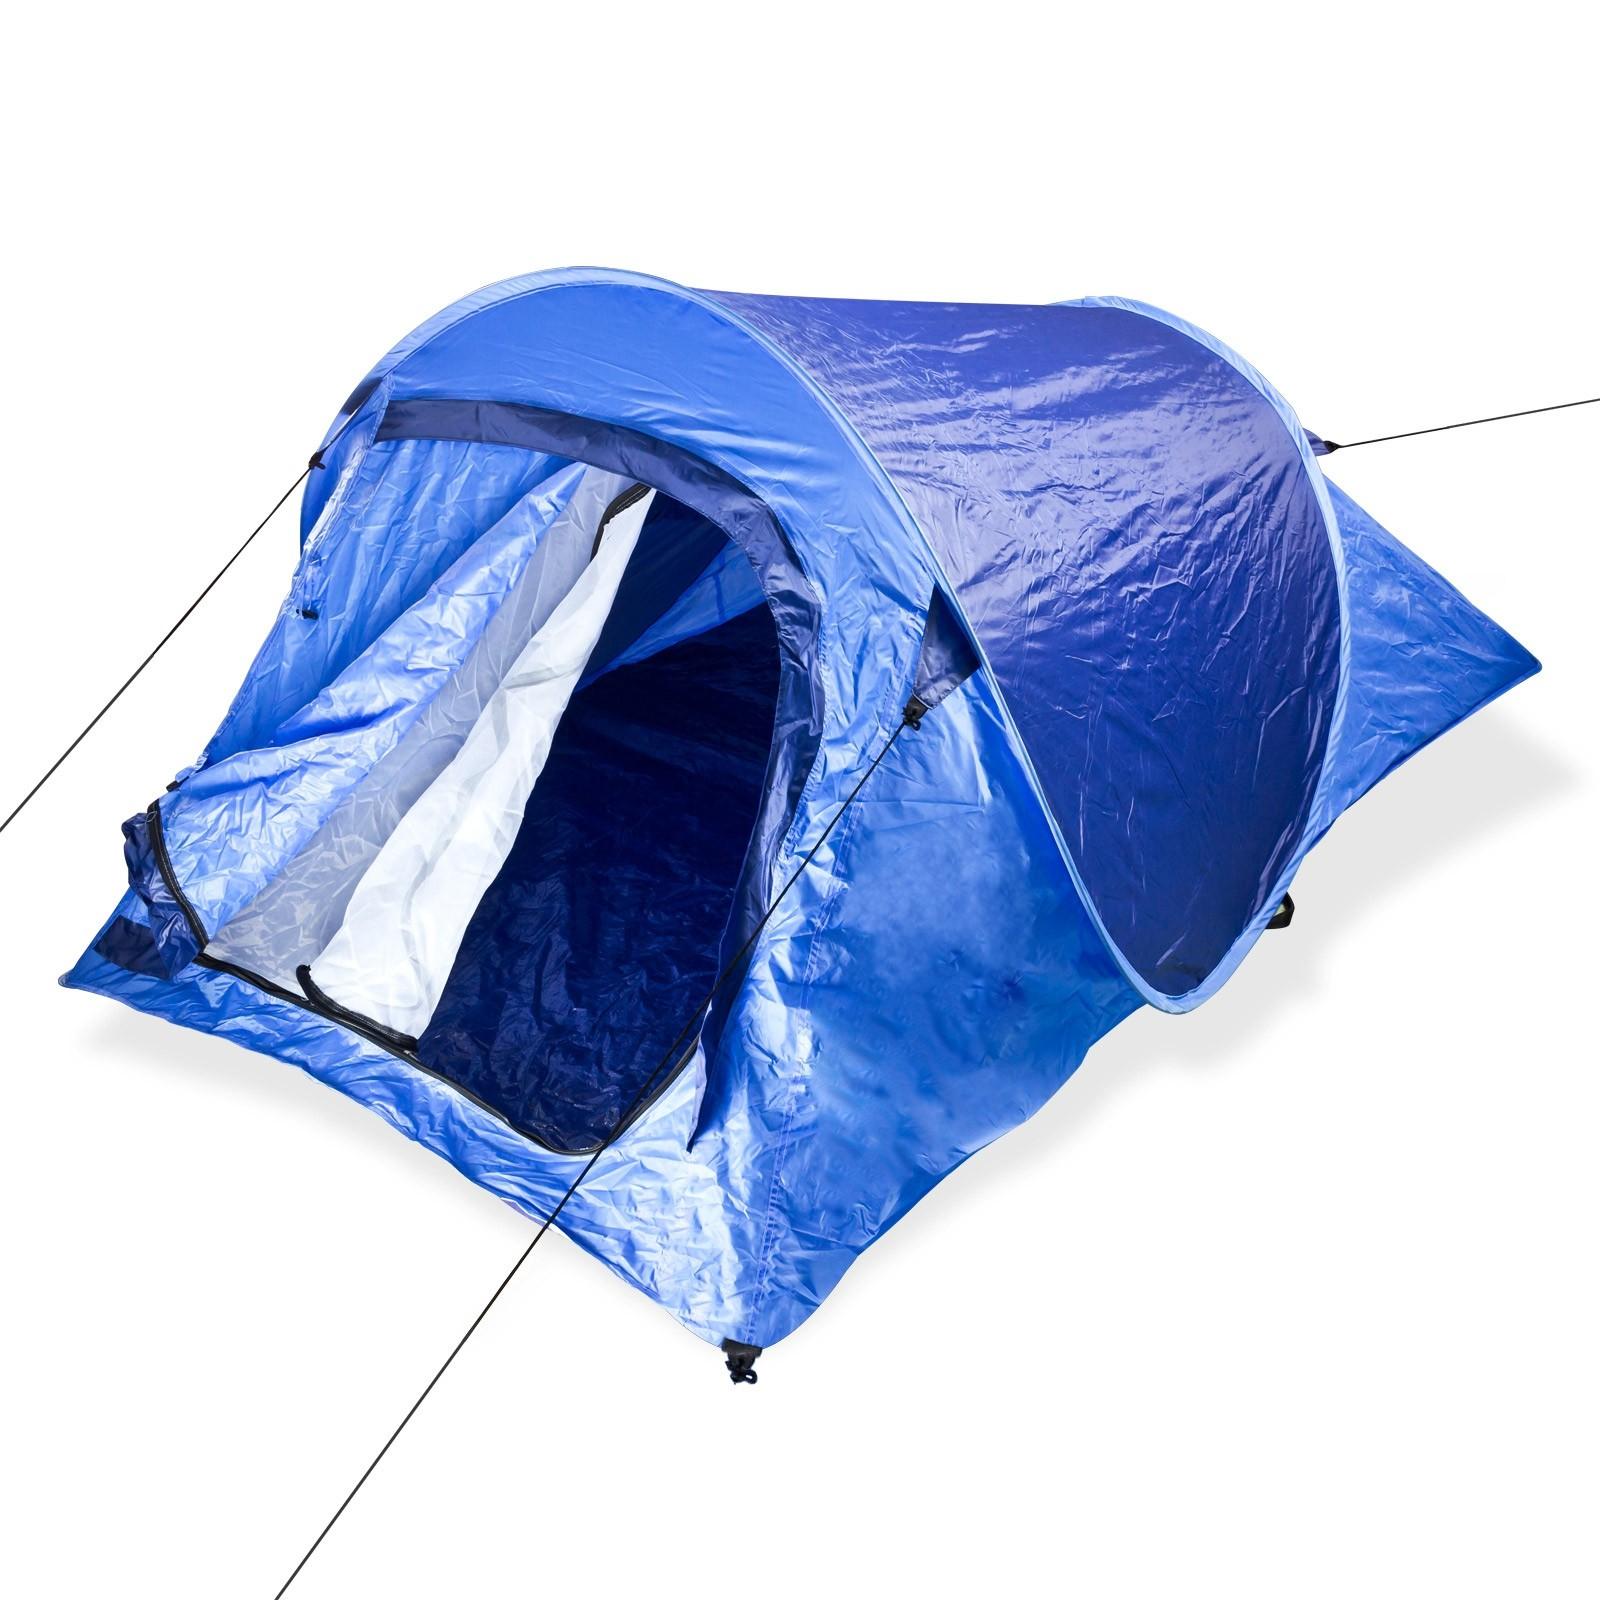 Dema Wurfzelt Pop Up Zelt Faltzelt für 2 Personen Campingzelt Festivalzelt 43244